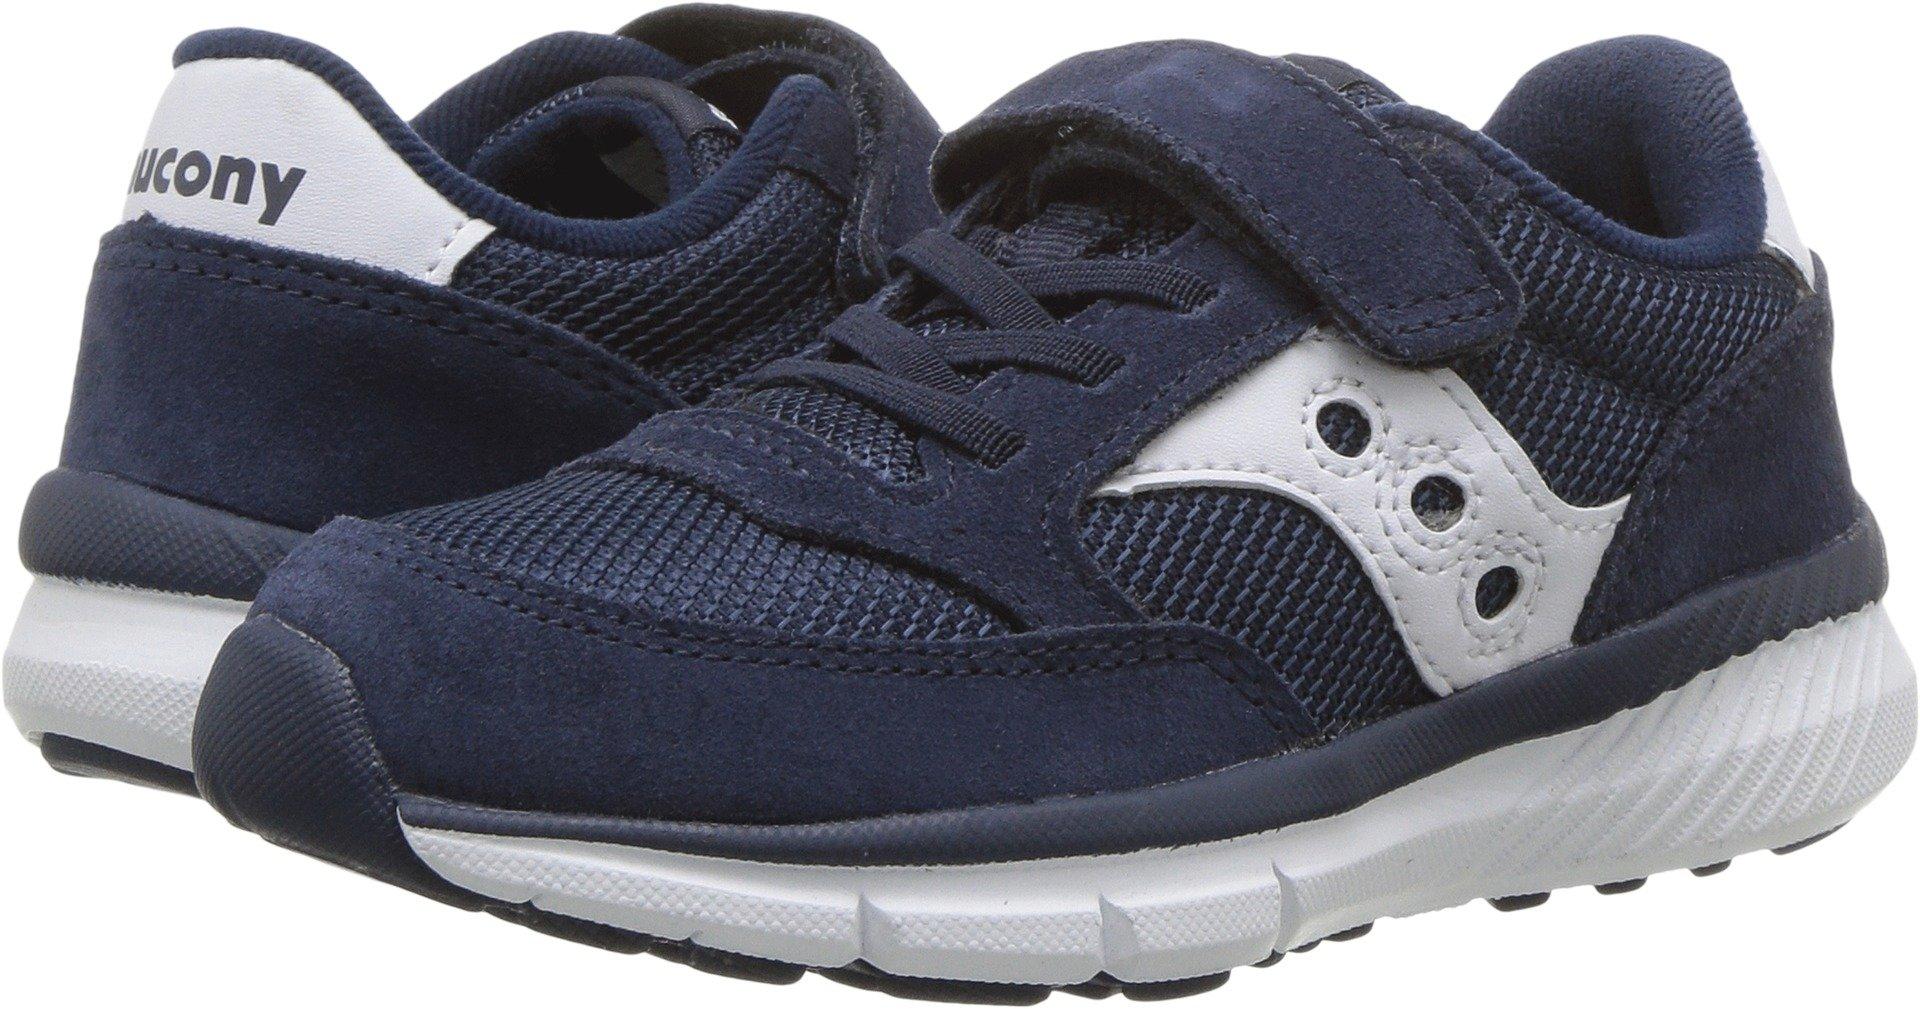 Saucony Jazz Lite A/C Sneaker (Little Kid), Navy/White, 13.5 Wide US Little Kid